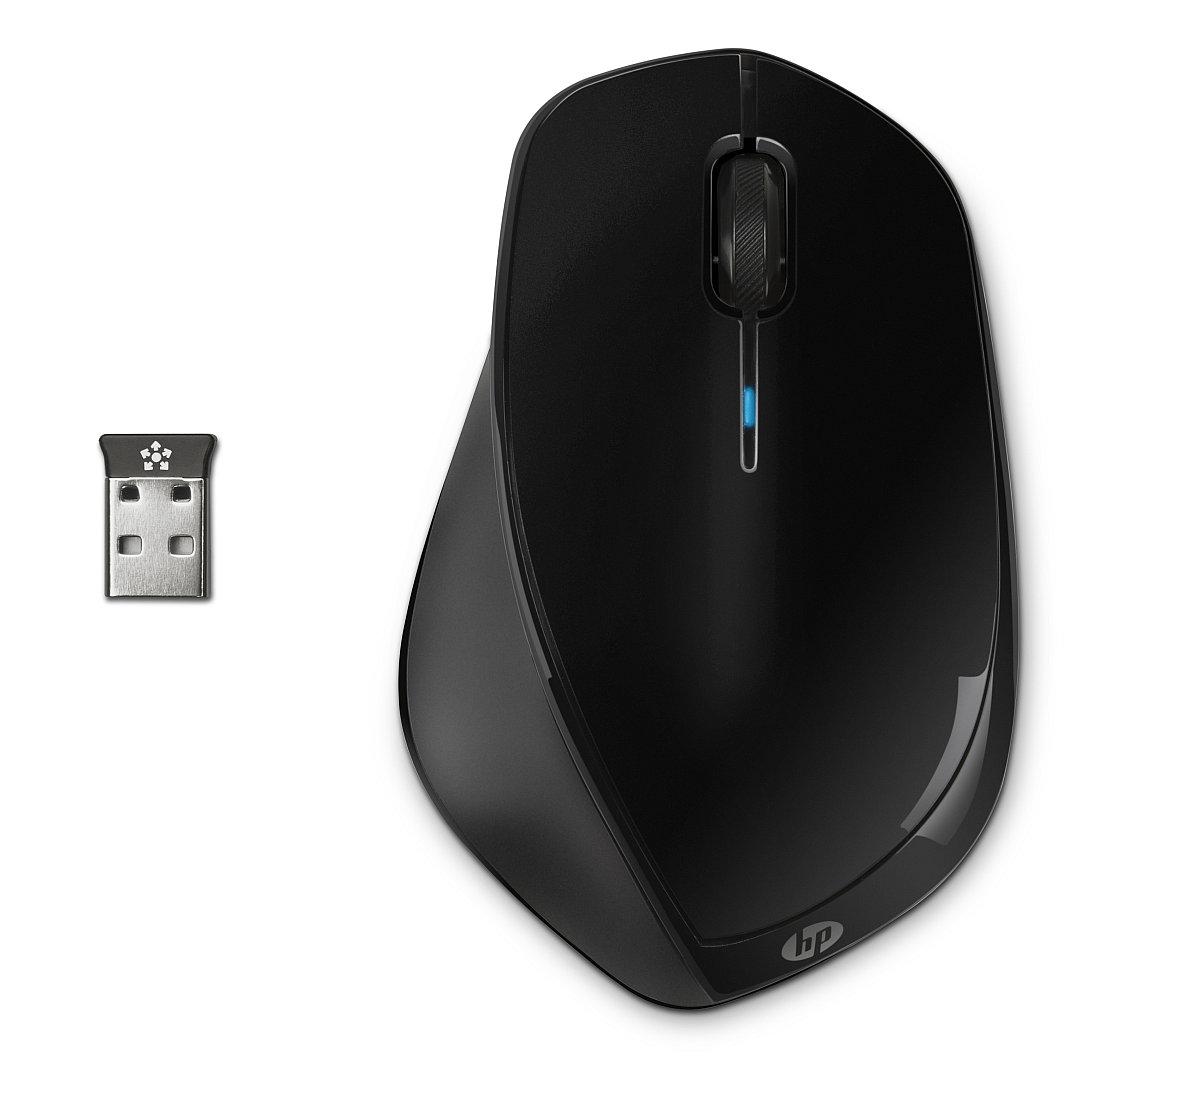 HP x4500 Wireless Mouse Black